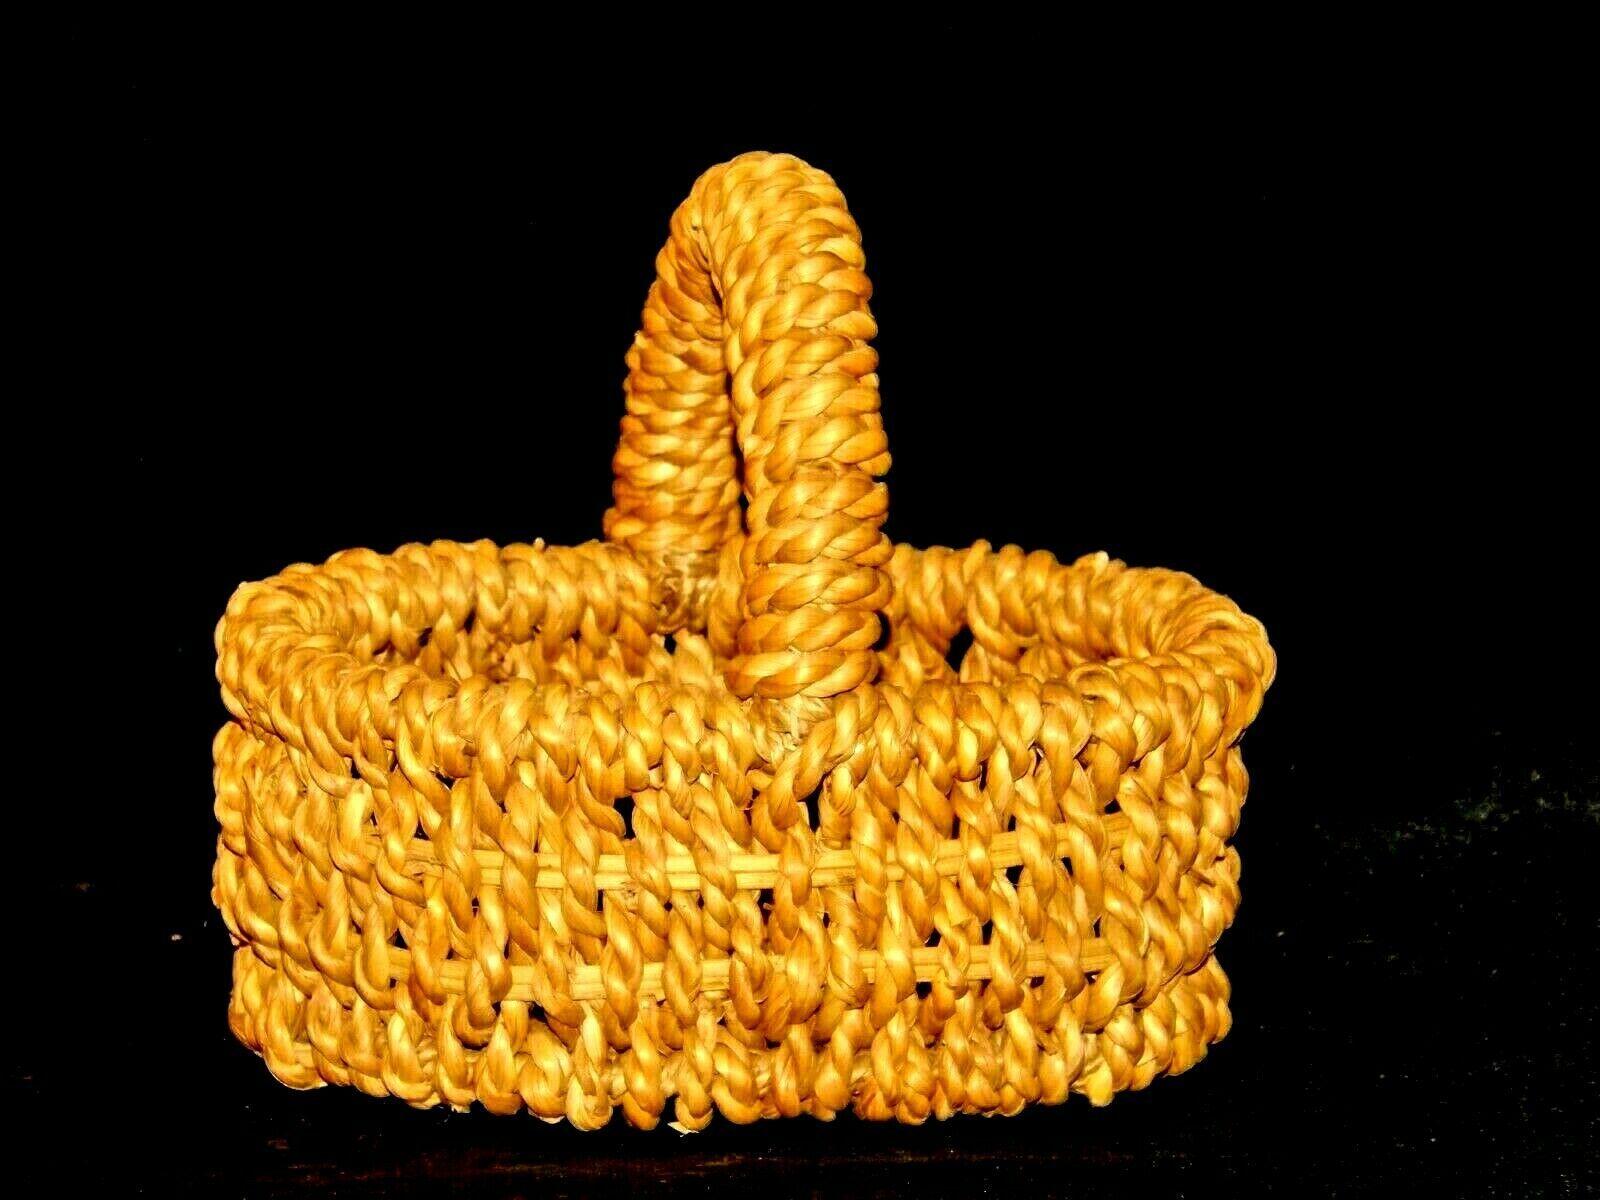 Handmade Woven Wicker Basket with Handle AA-191713 Vintage Collectible